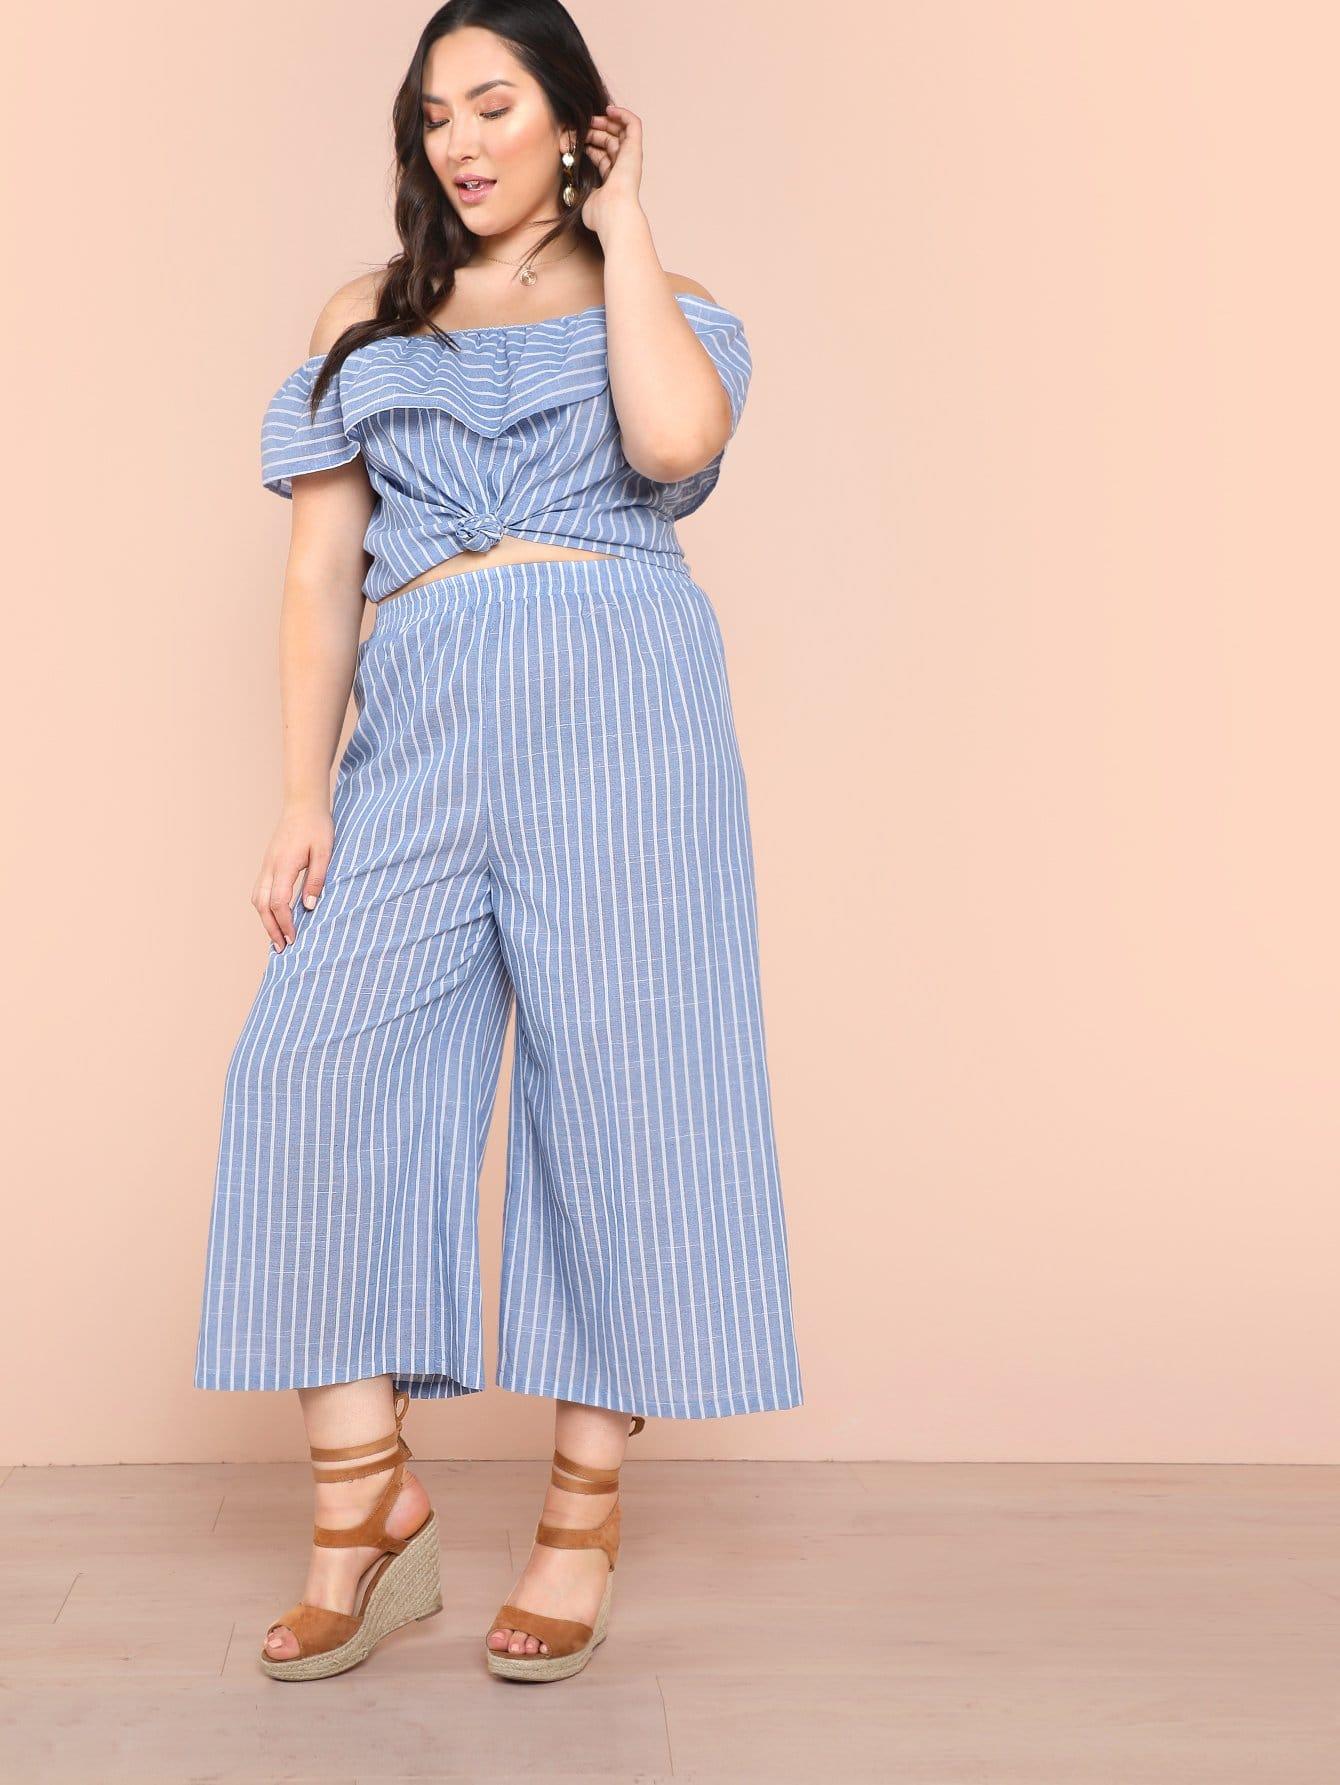 Plus Knot Hem Foldover Bardot Top & Wide Leg Pants Set edith marquez feria juarez